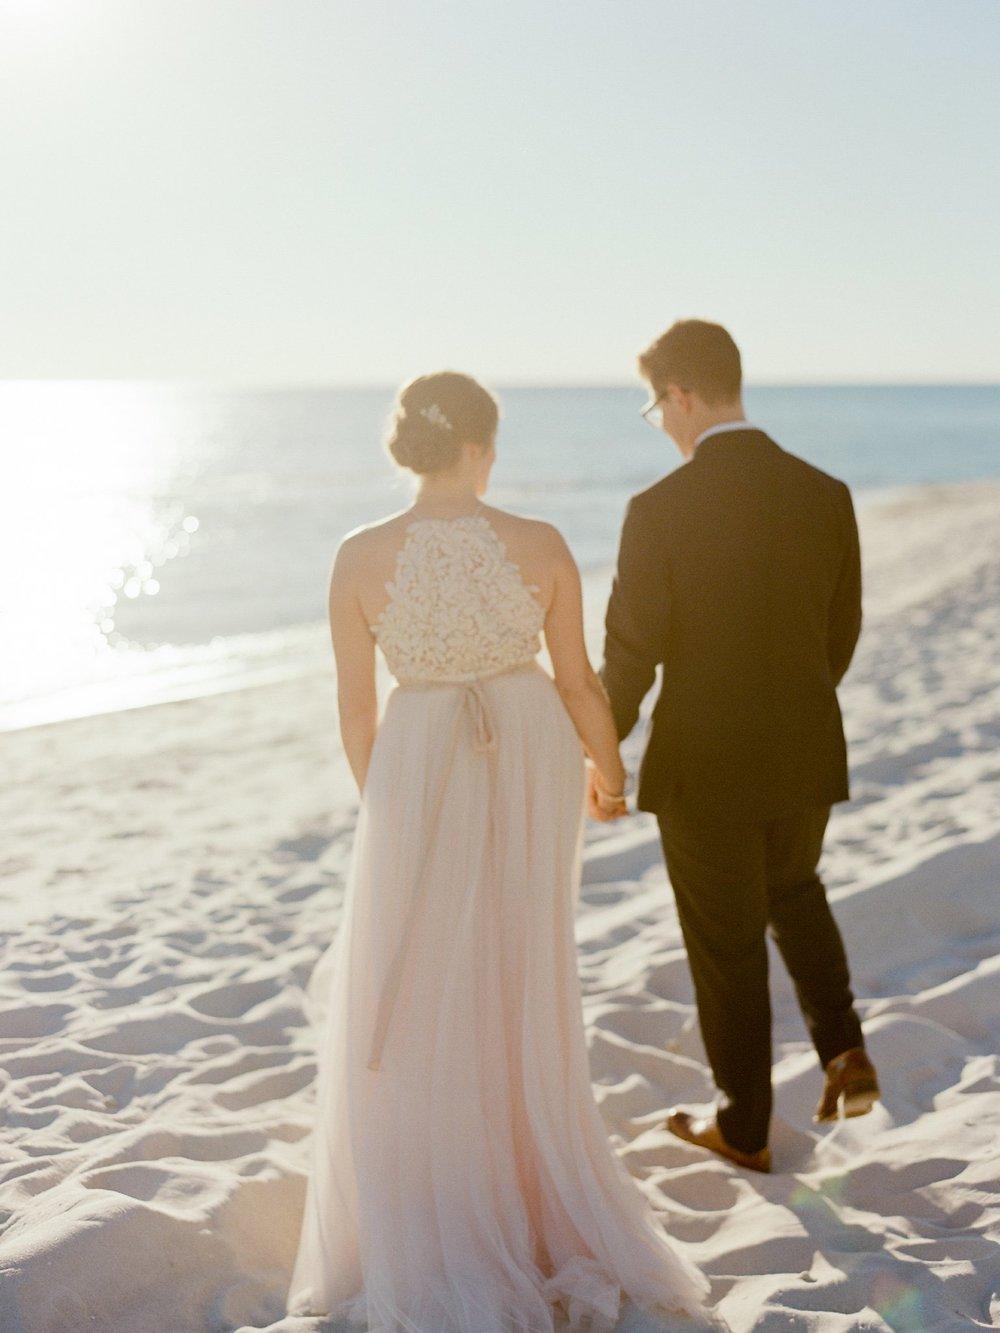 inlet beach wedding 30a wedding inlet beach wedding photographer shannon griffin photography_0025.jpg